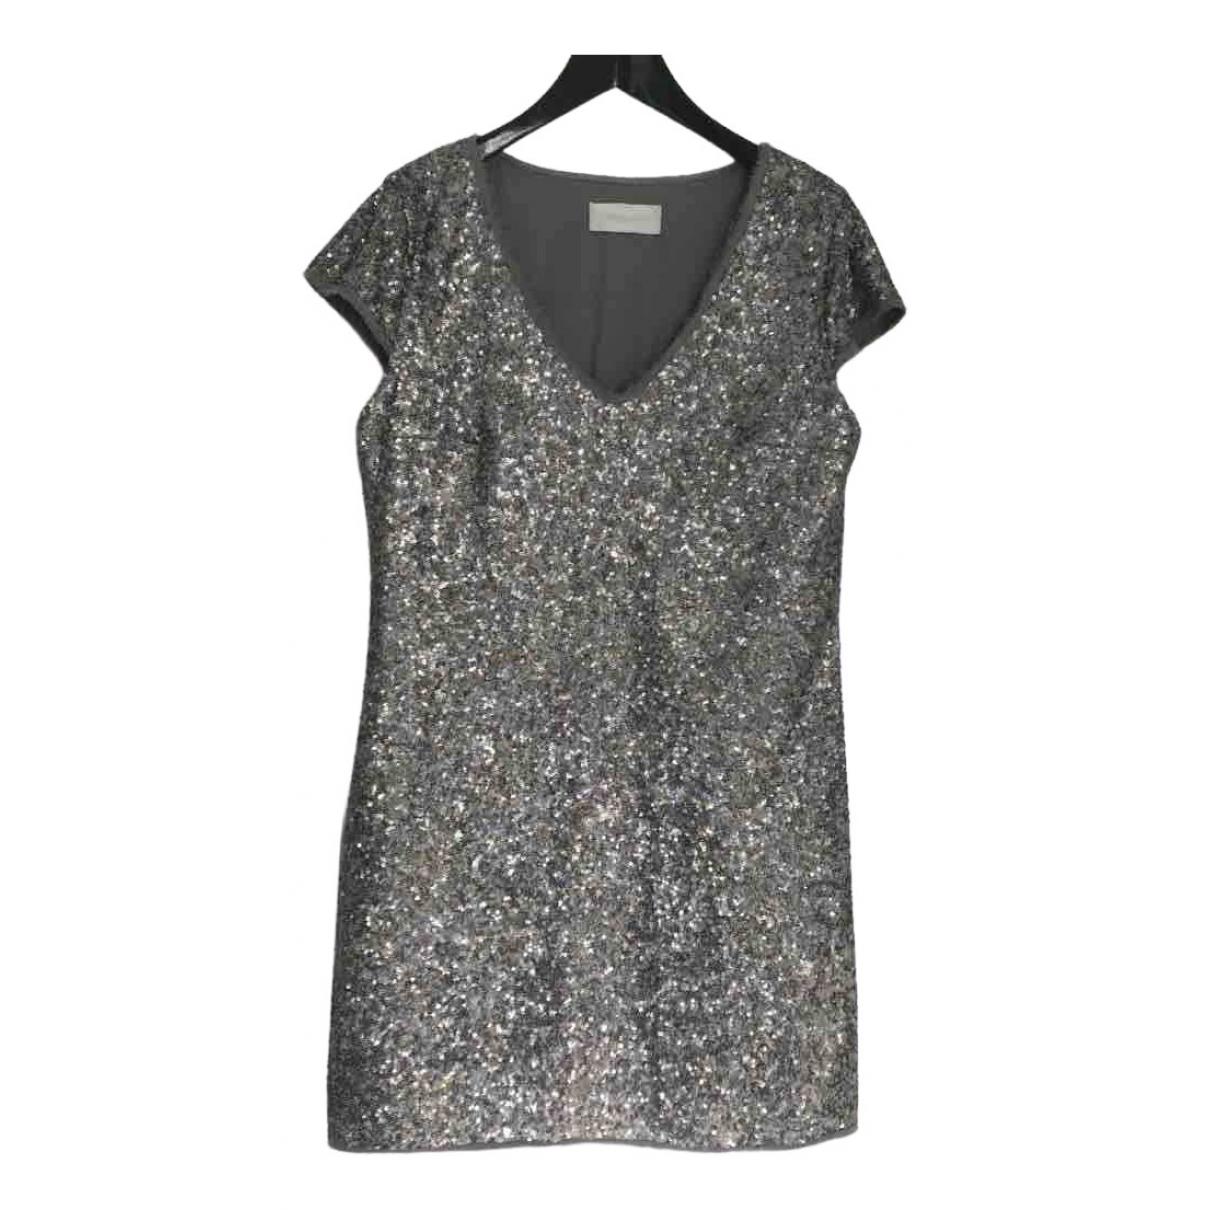 Zadig & Voltaire \N Silver Glitter dress for Women 38 FR